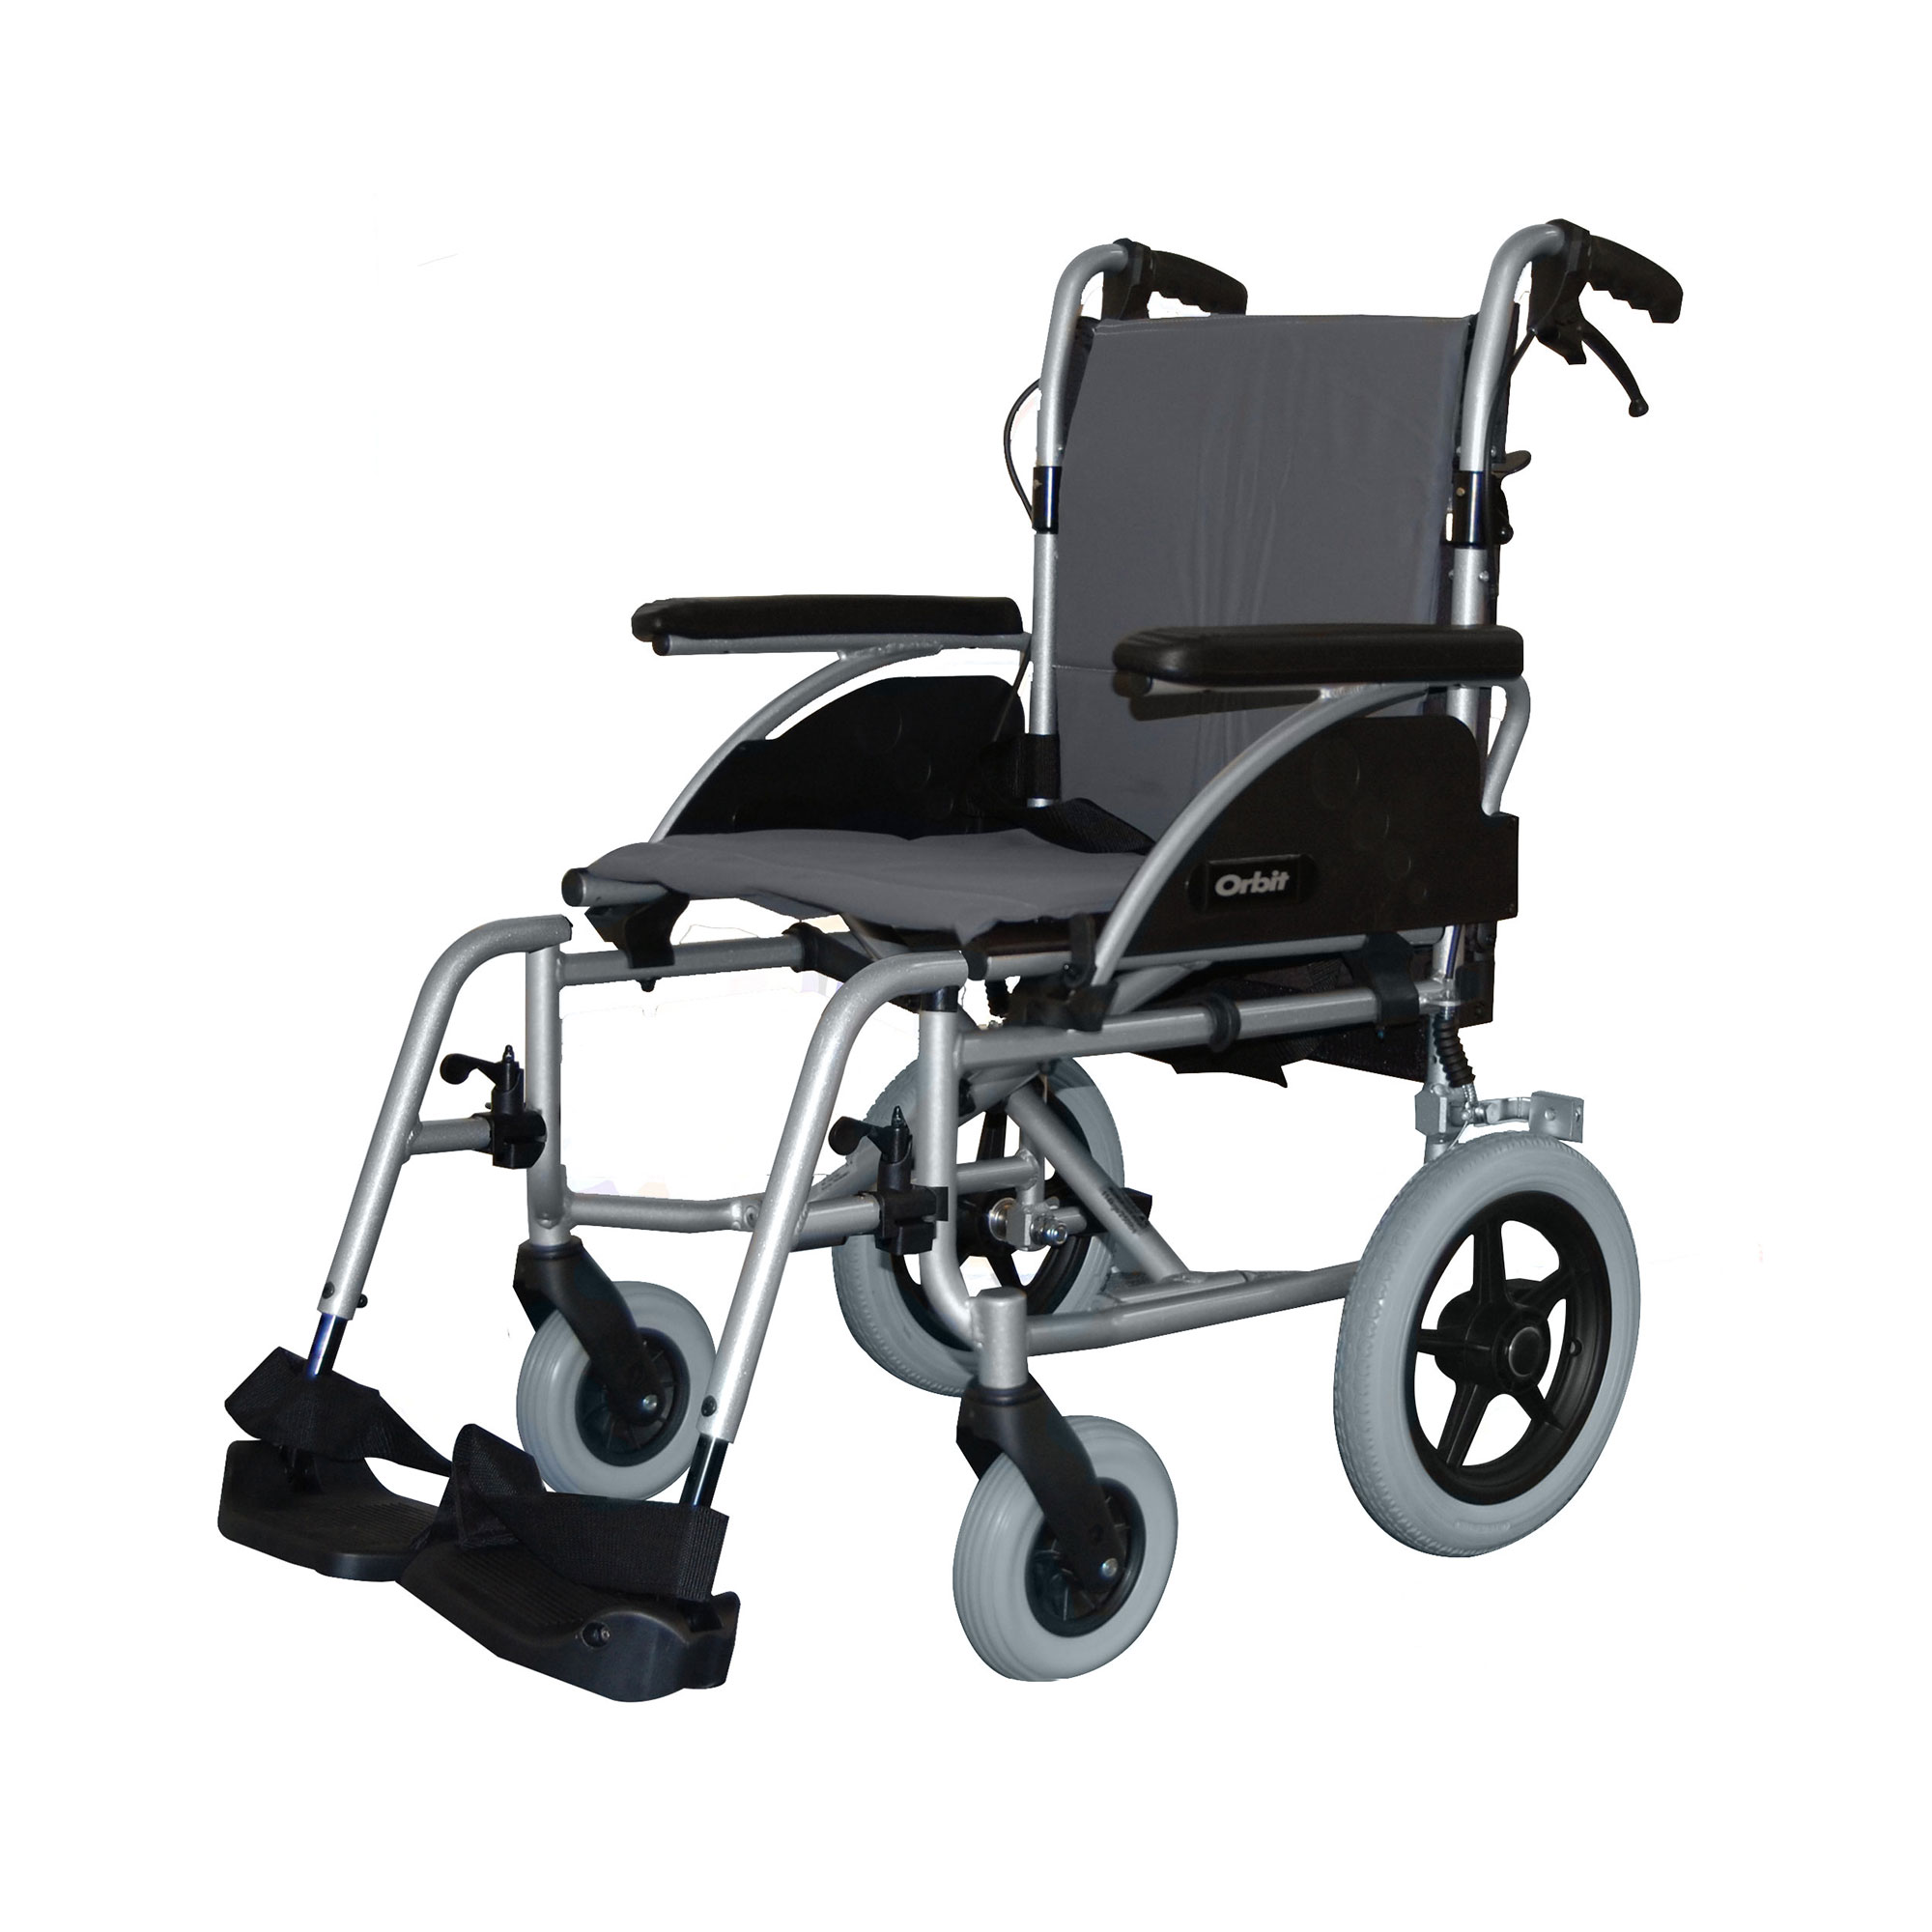 1330 Orbit Lightweight Car Transit Wheelchair Roma Medical